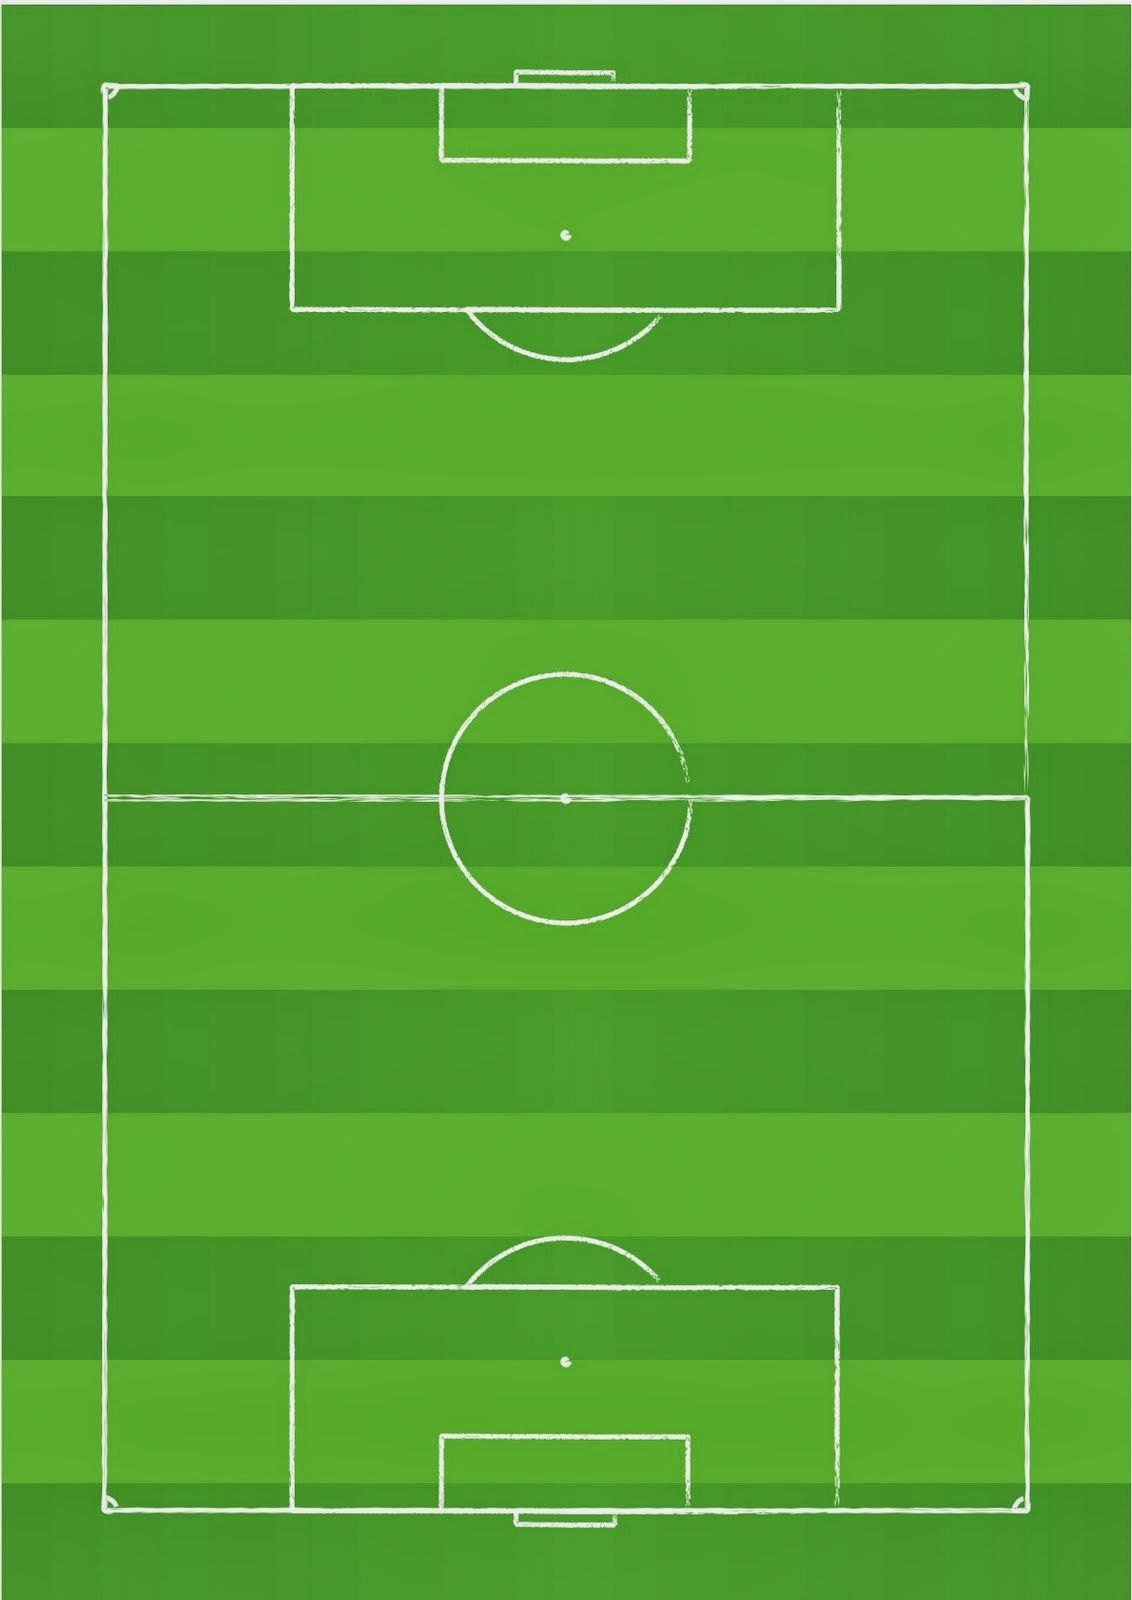 Kit para Fiestas de Futbol, para Imprimir gratis..